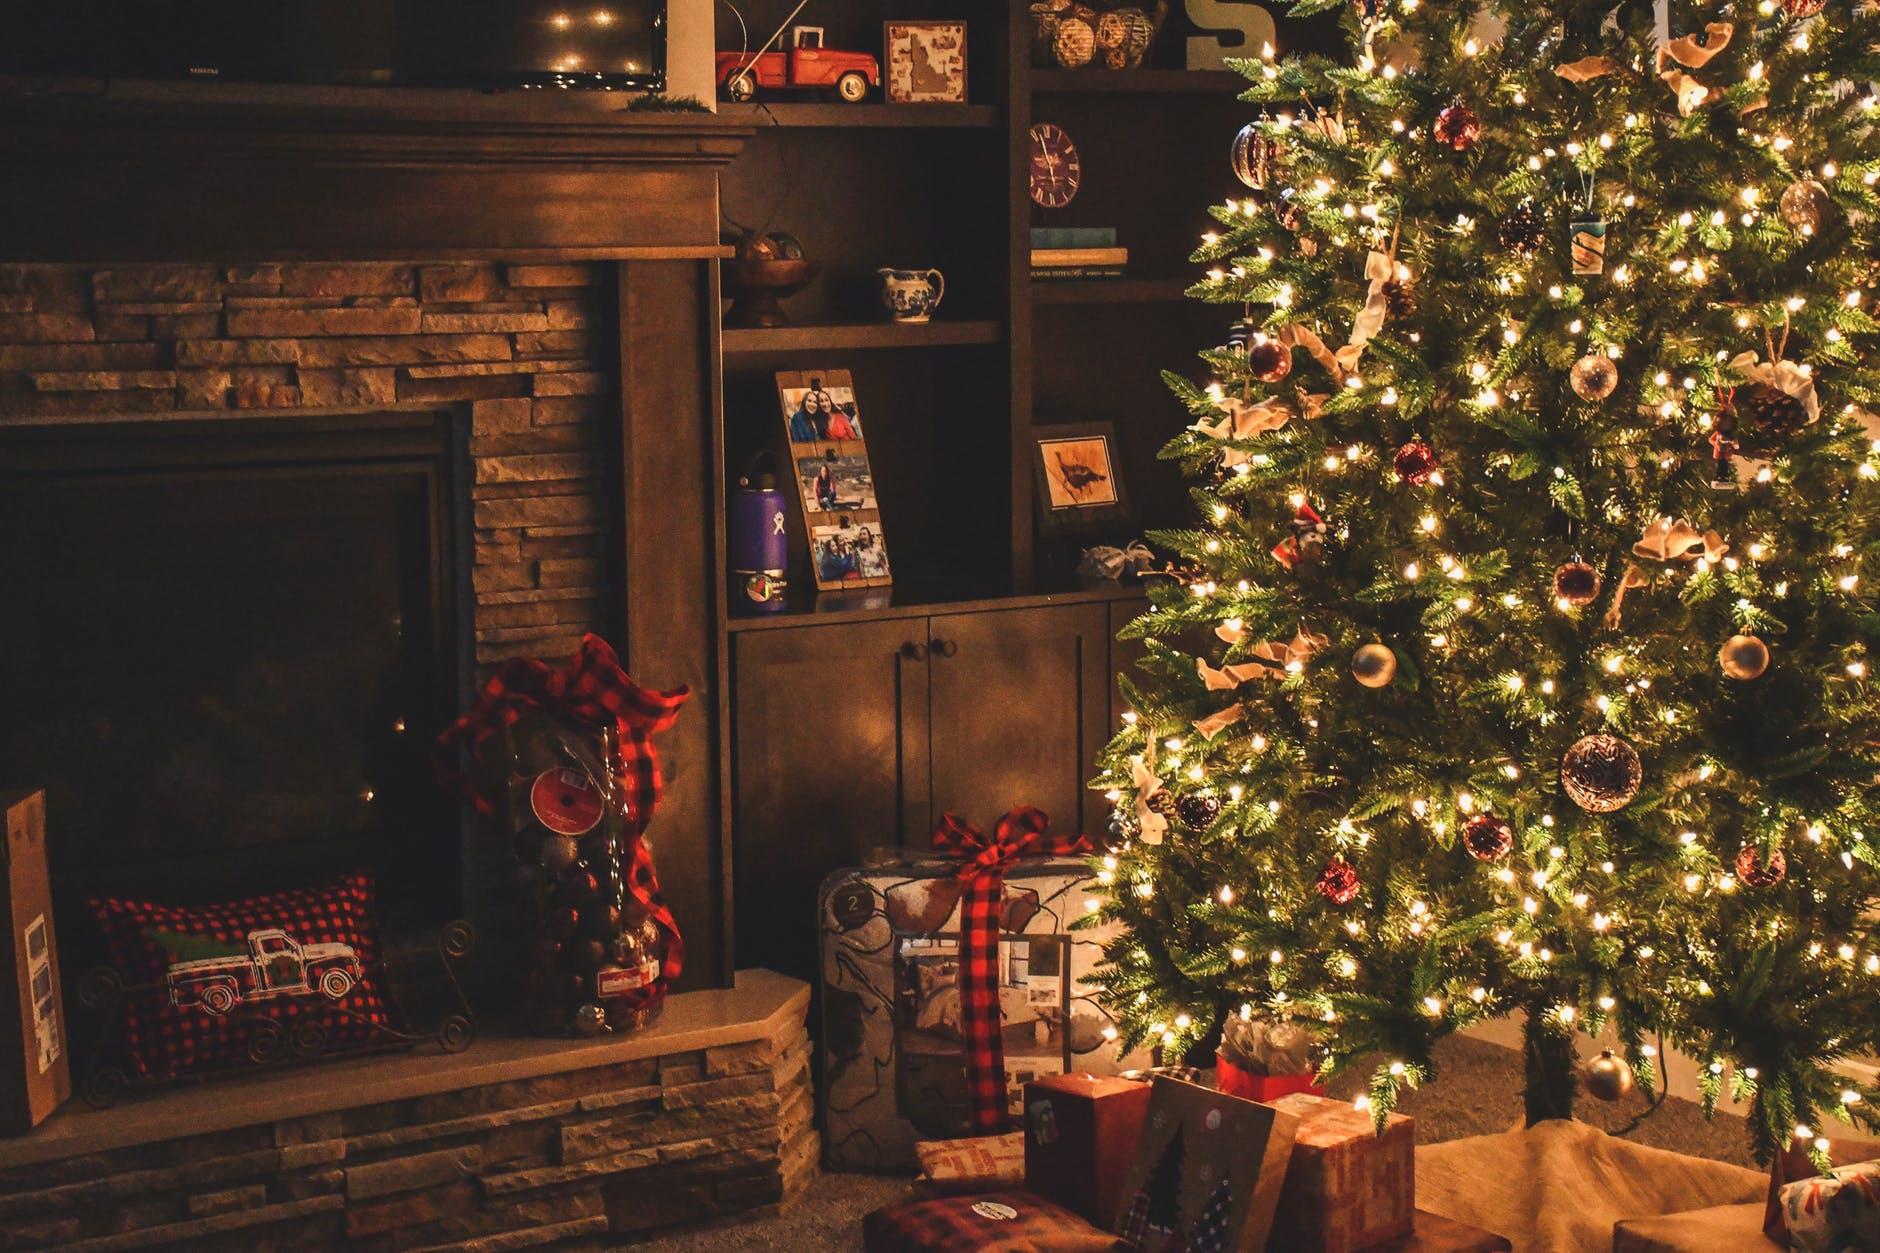 Regali a Natale